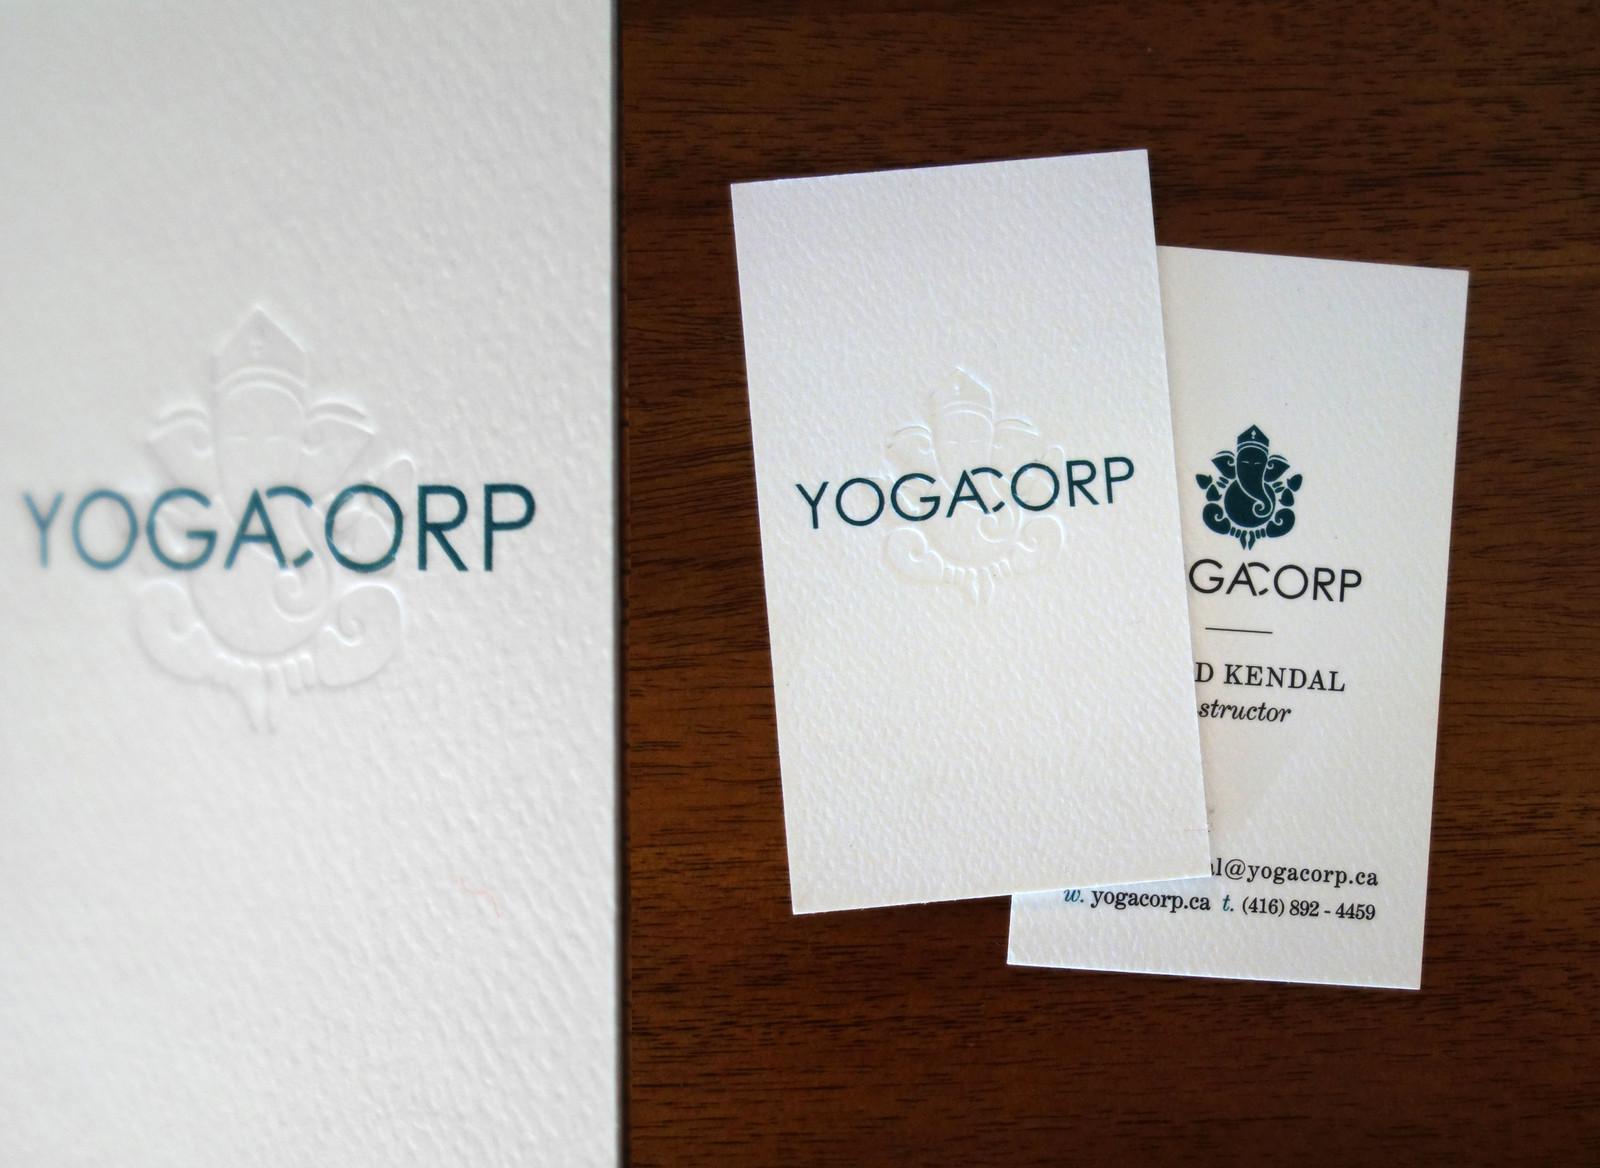 Business Cards | Branding + Design | Toronto | Studio 3 Design Co.